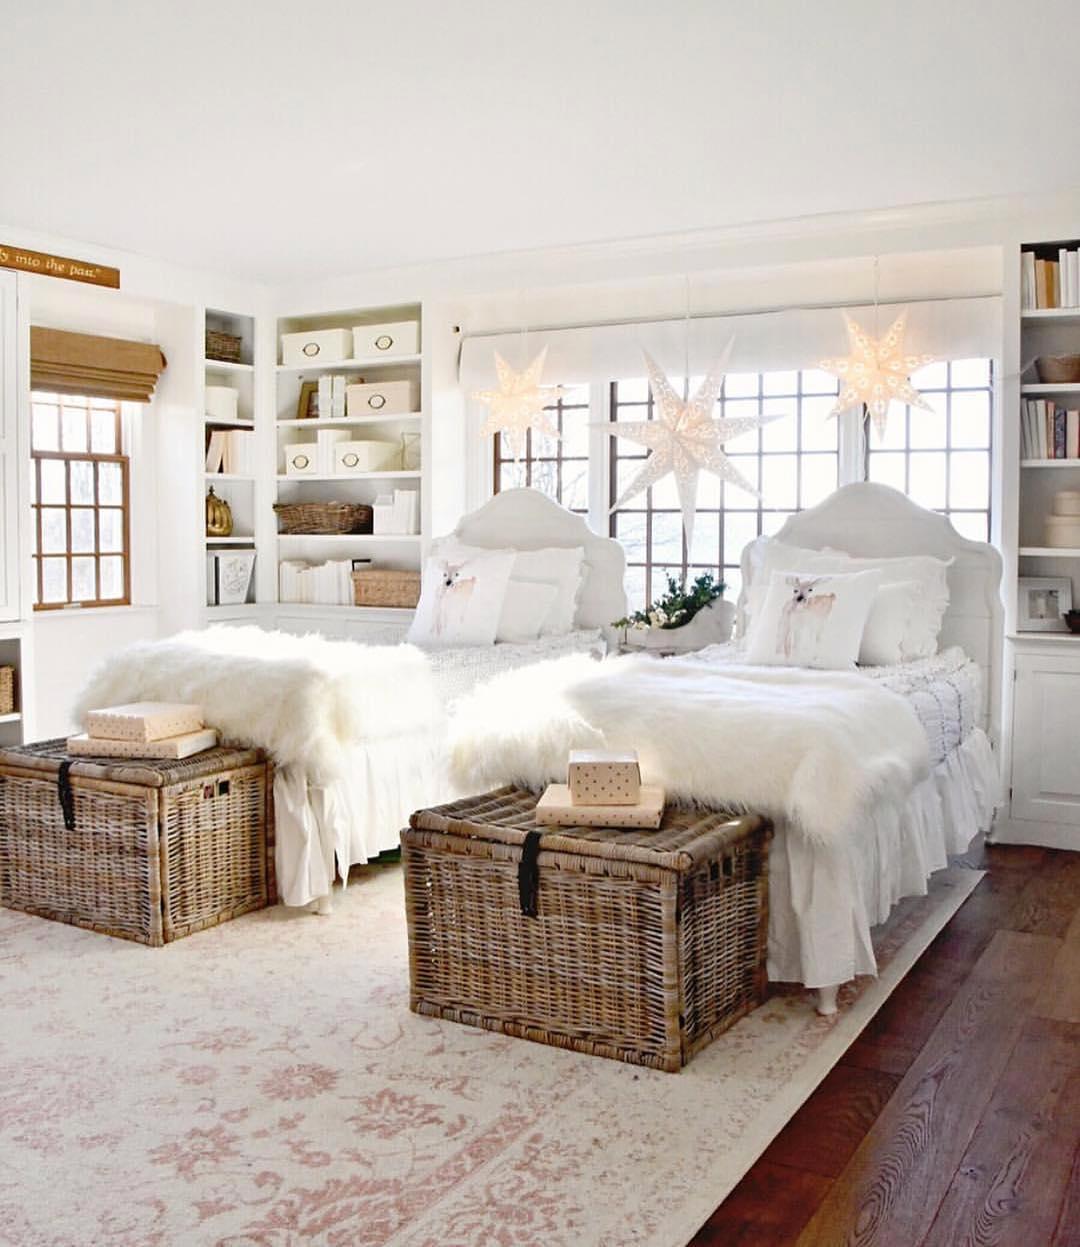 Dreamy Bedroom Decorating Ideas Vintage Style Wallpaper Bedroom Bedroom Furniture Argos Bedroom Decor Picture Frames: 45+ Impressive Vintage Bedroom Decor Ideas For 2018